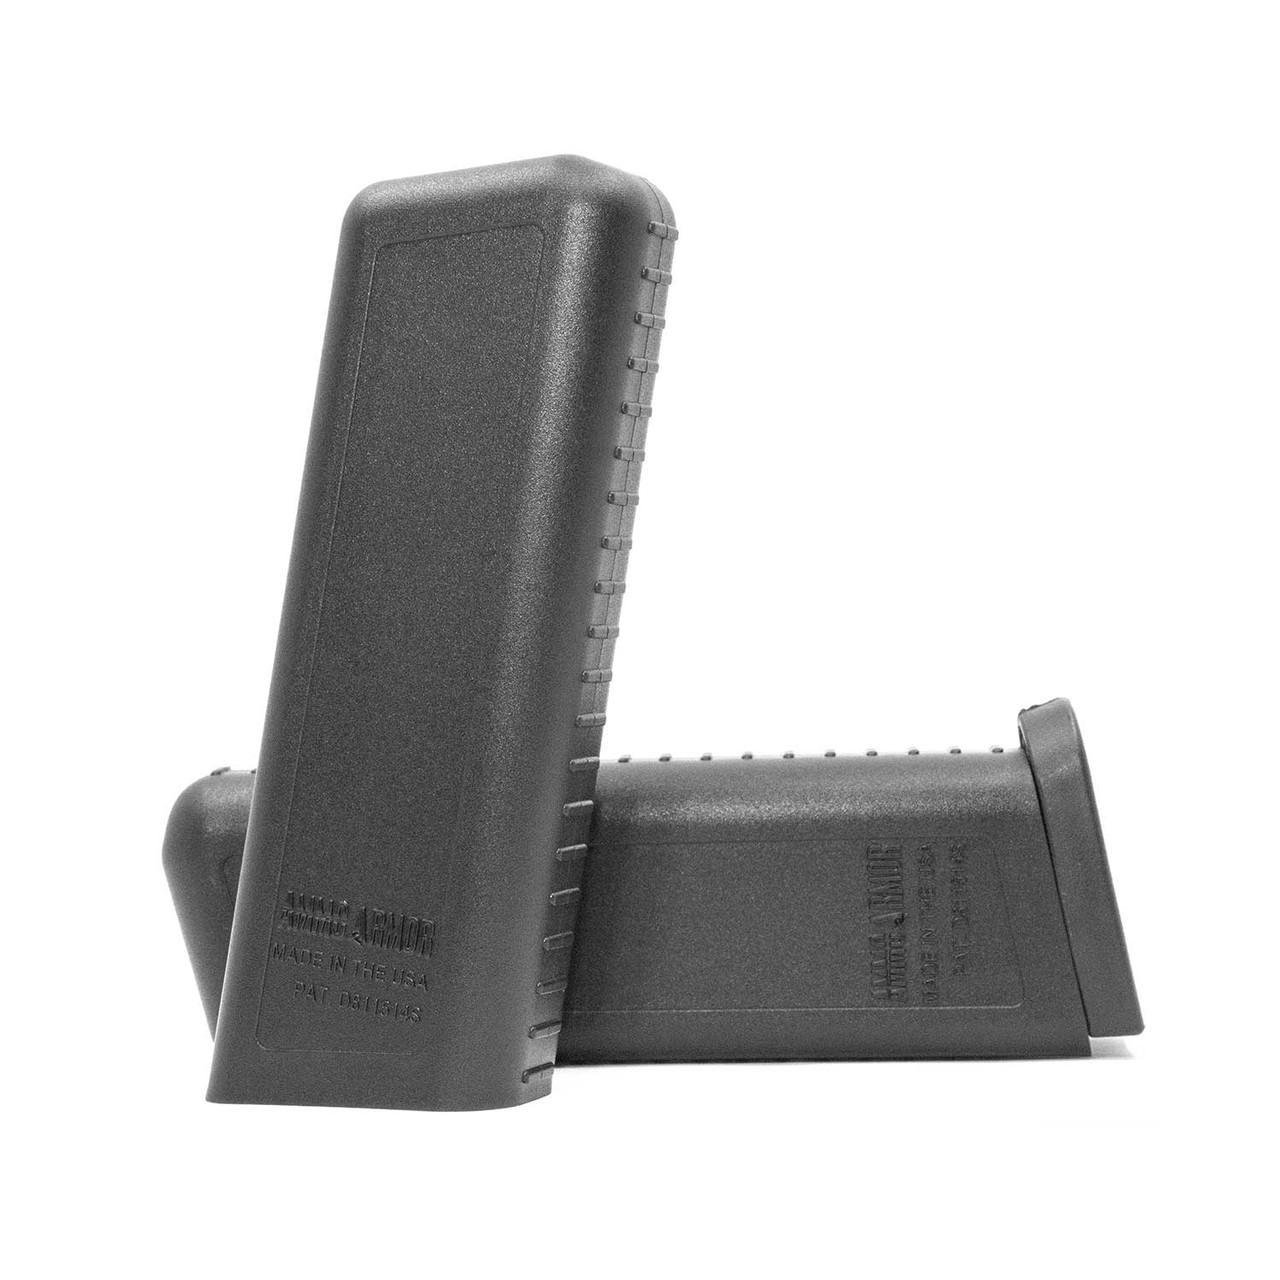 Smith & Wesson M&P Shield 380 EZ Ammo Armor